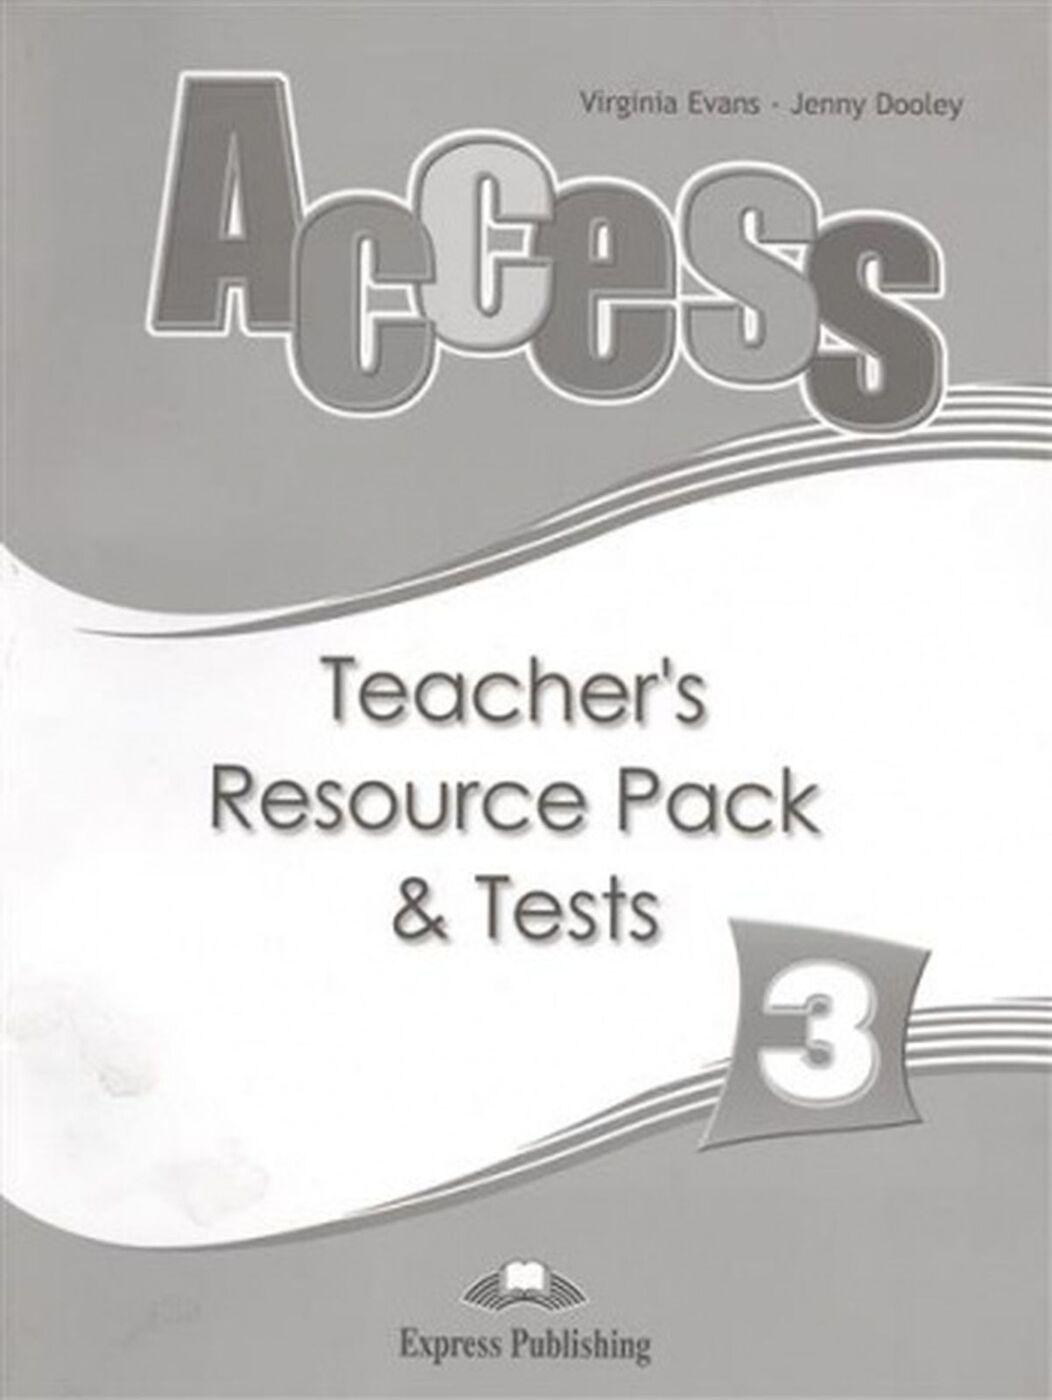 Virginia Evans, Jenny Dooley. Access 3: Teacher's Resource Pack & Tests | Дули Дженни, Эванс Вирджиния